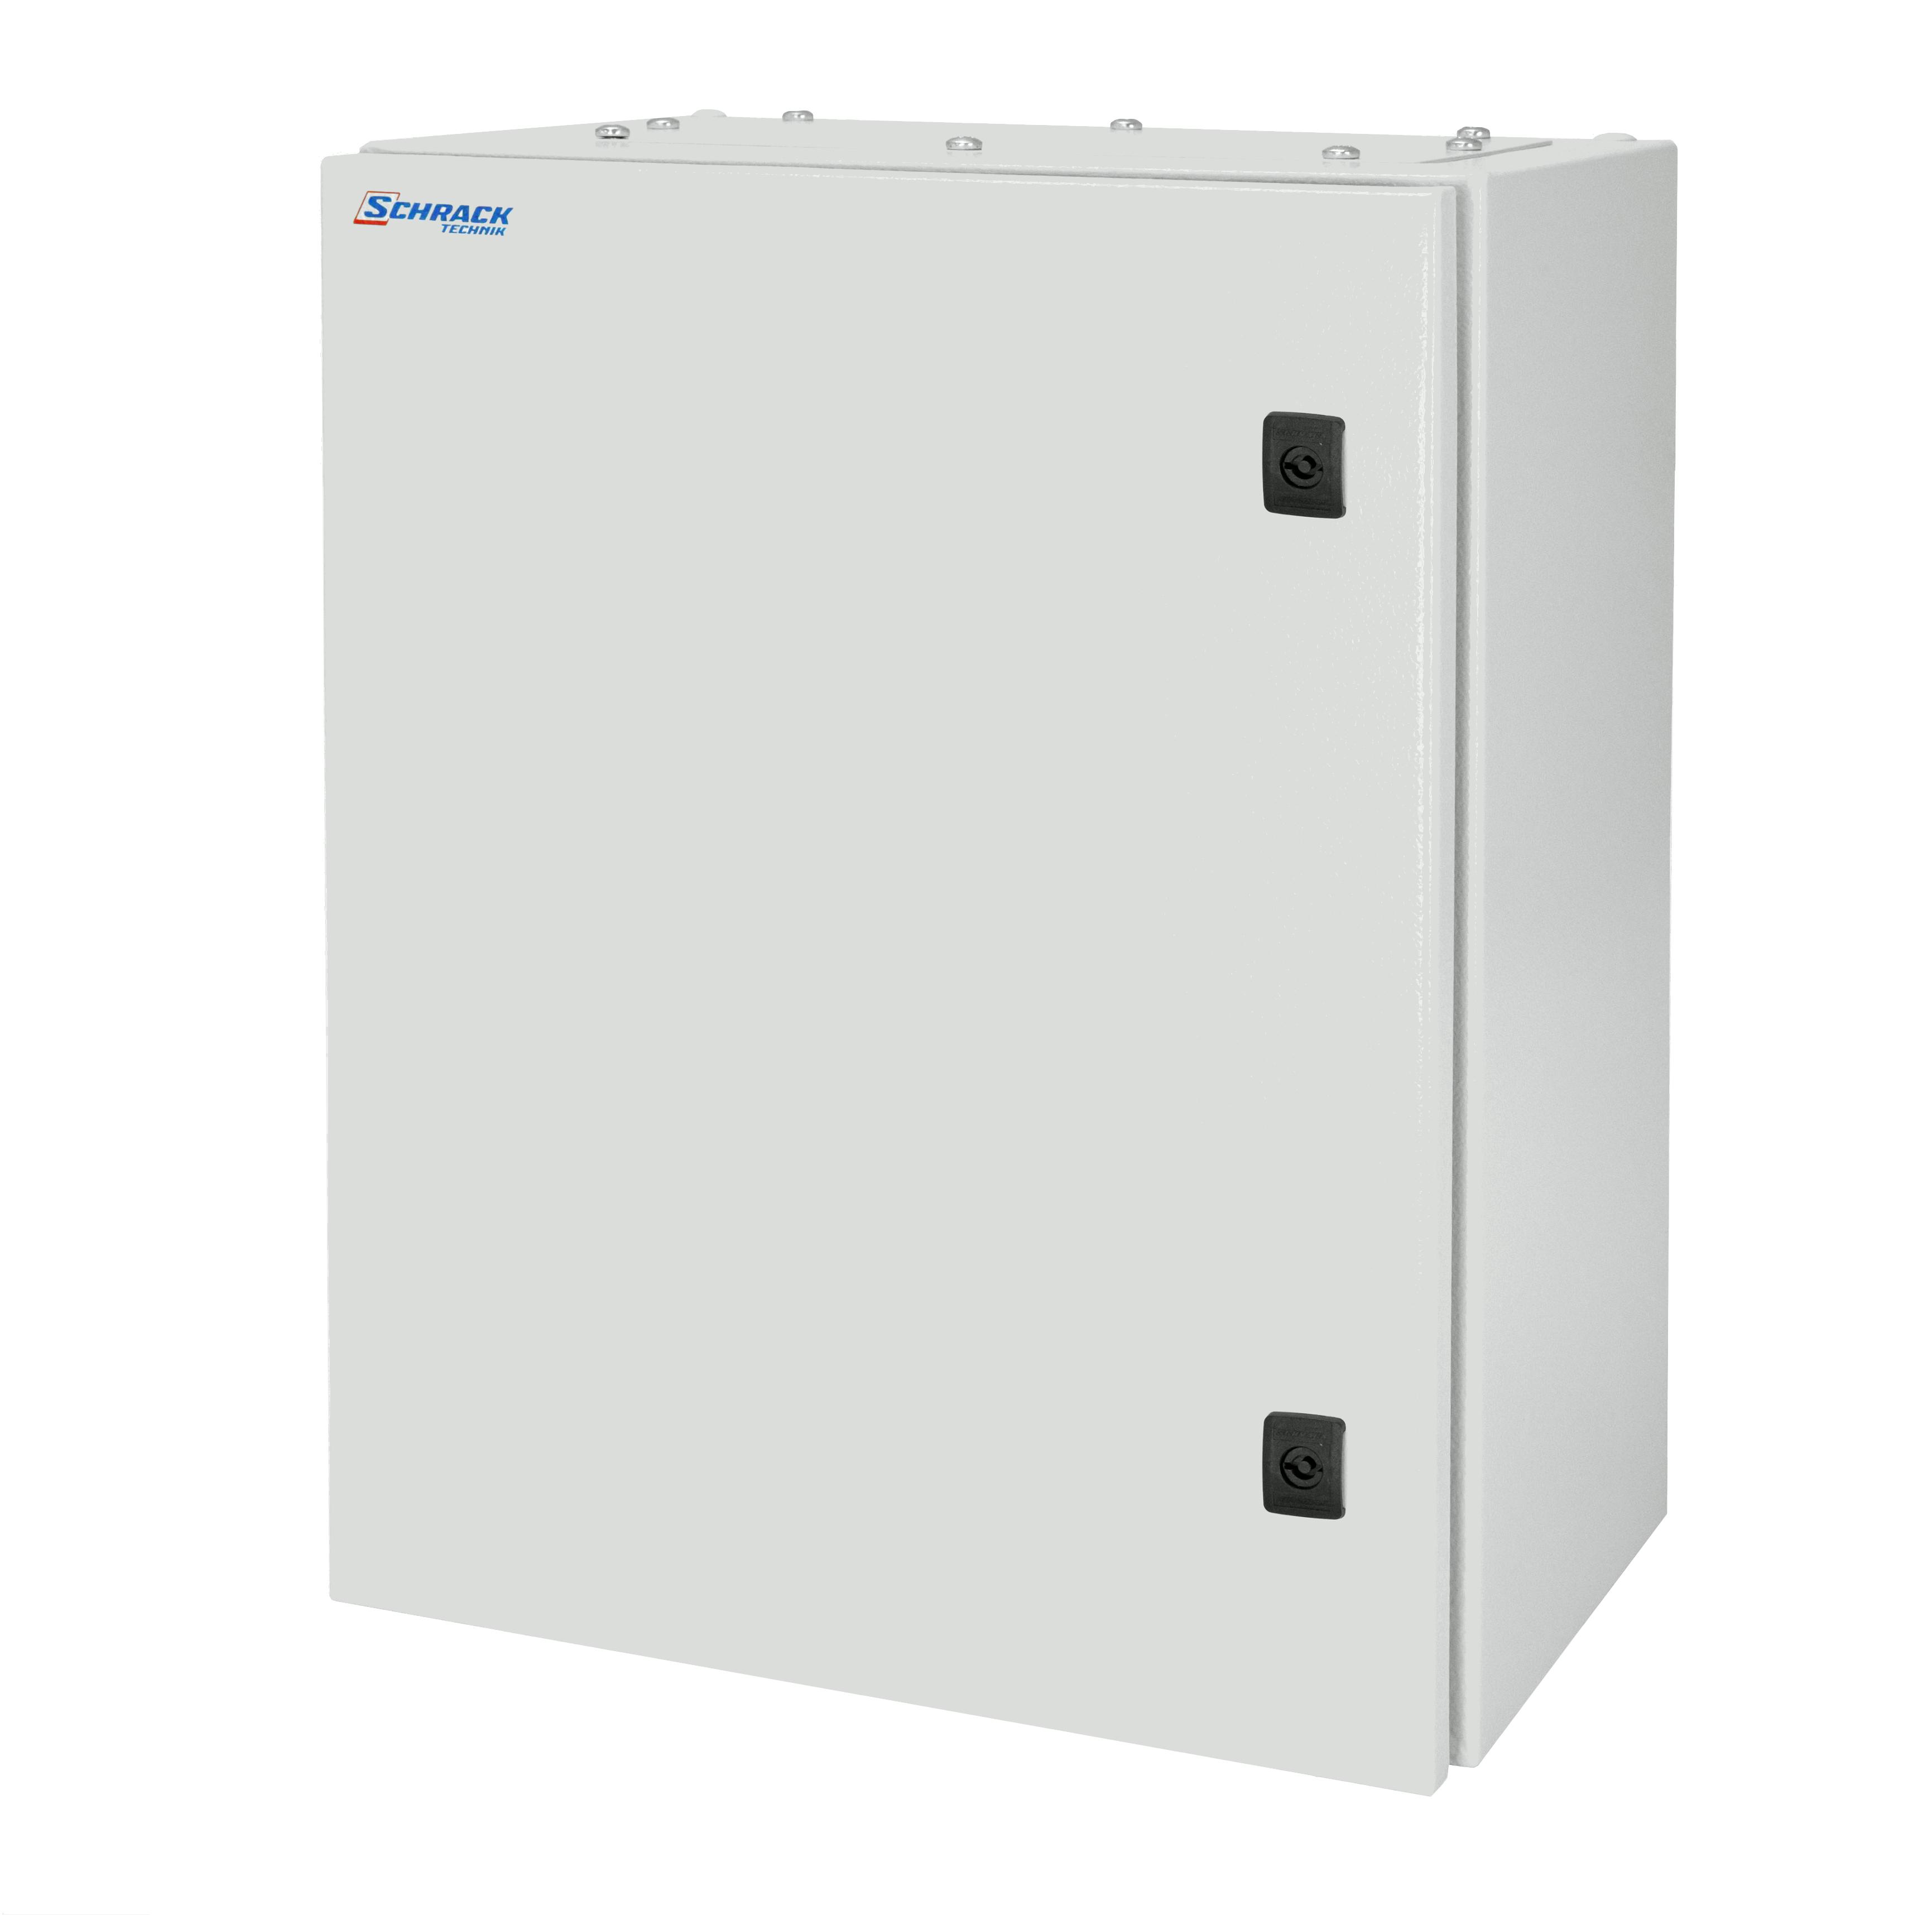 1 Stk Wandschrank Mono IP66 H=800 B=600 T=400 Stahlblech WSM8060400